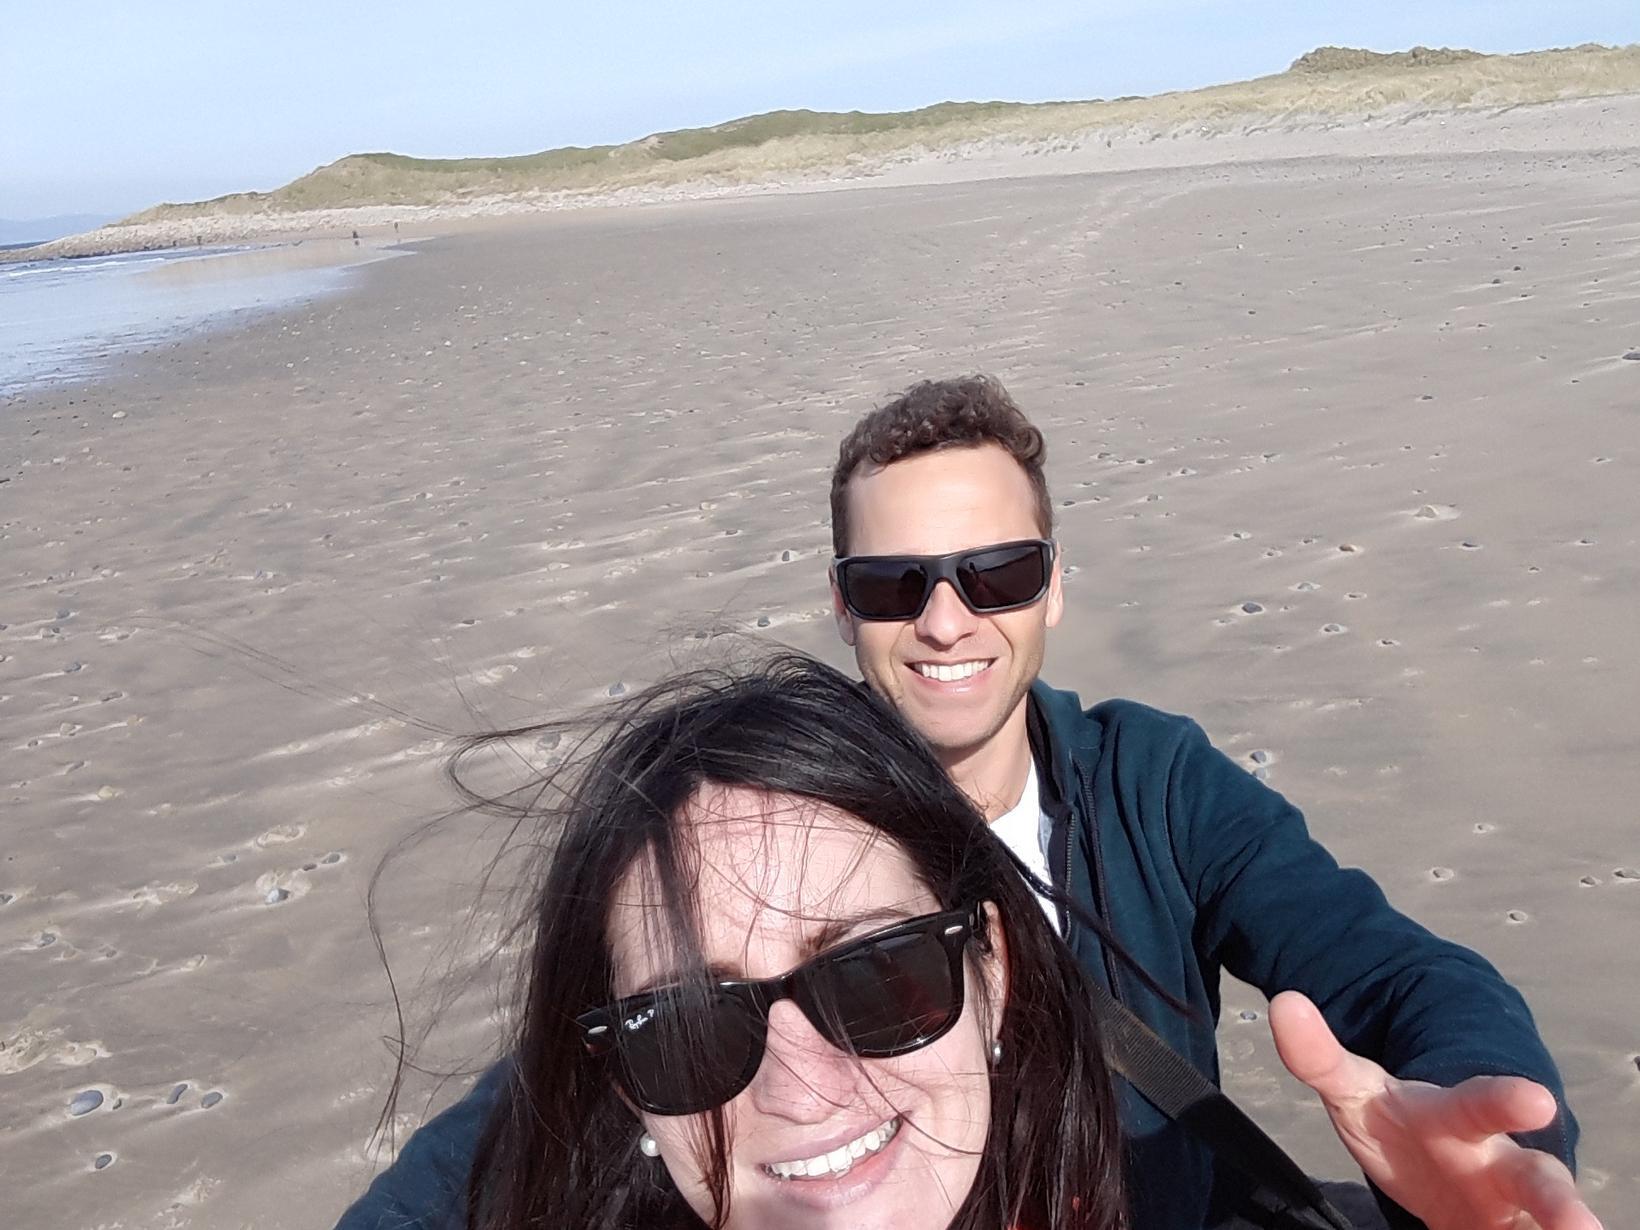 Catriona & Dan from Sligo, Ireland